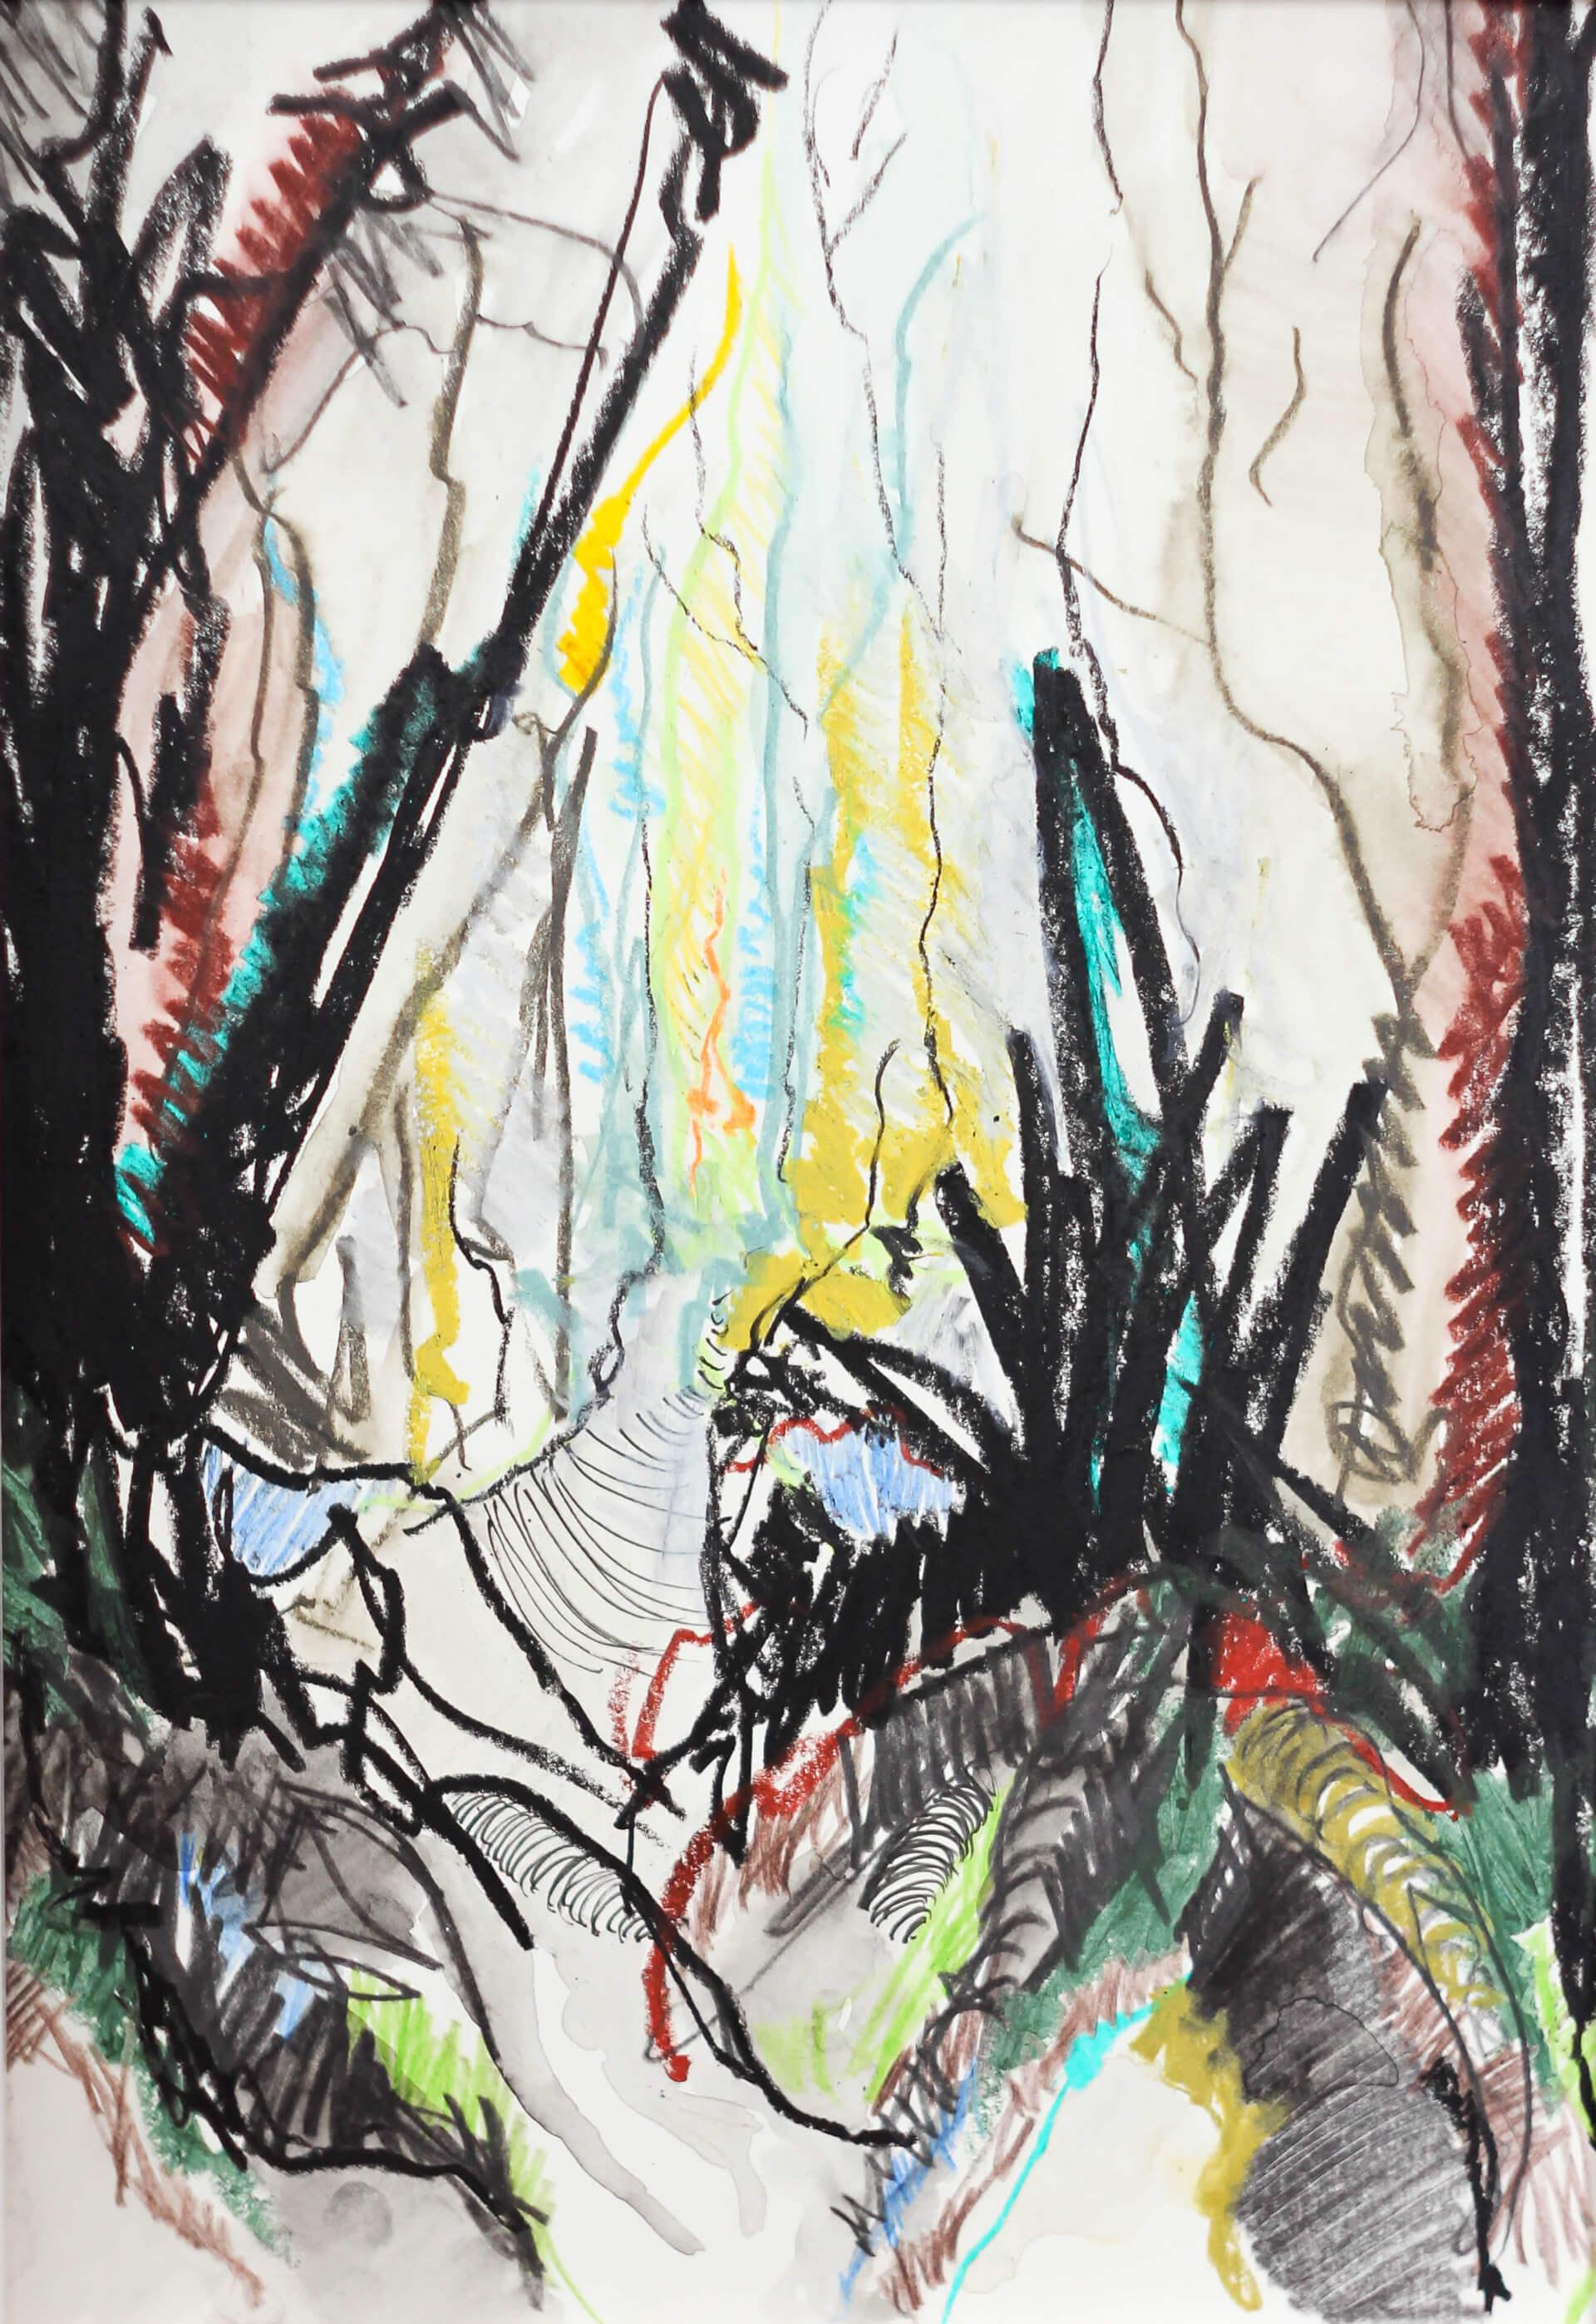 Katharina Albers, Wald I, 2014, Ölkreide, Tusche, Aquarell, Graphit auf Papier, 29,7×21 cm